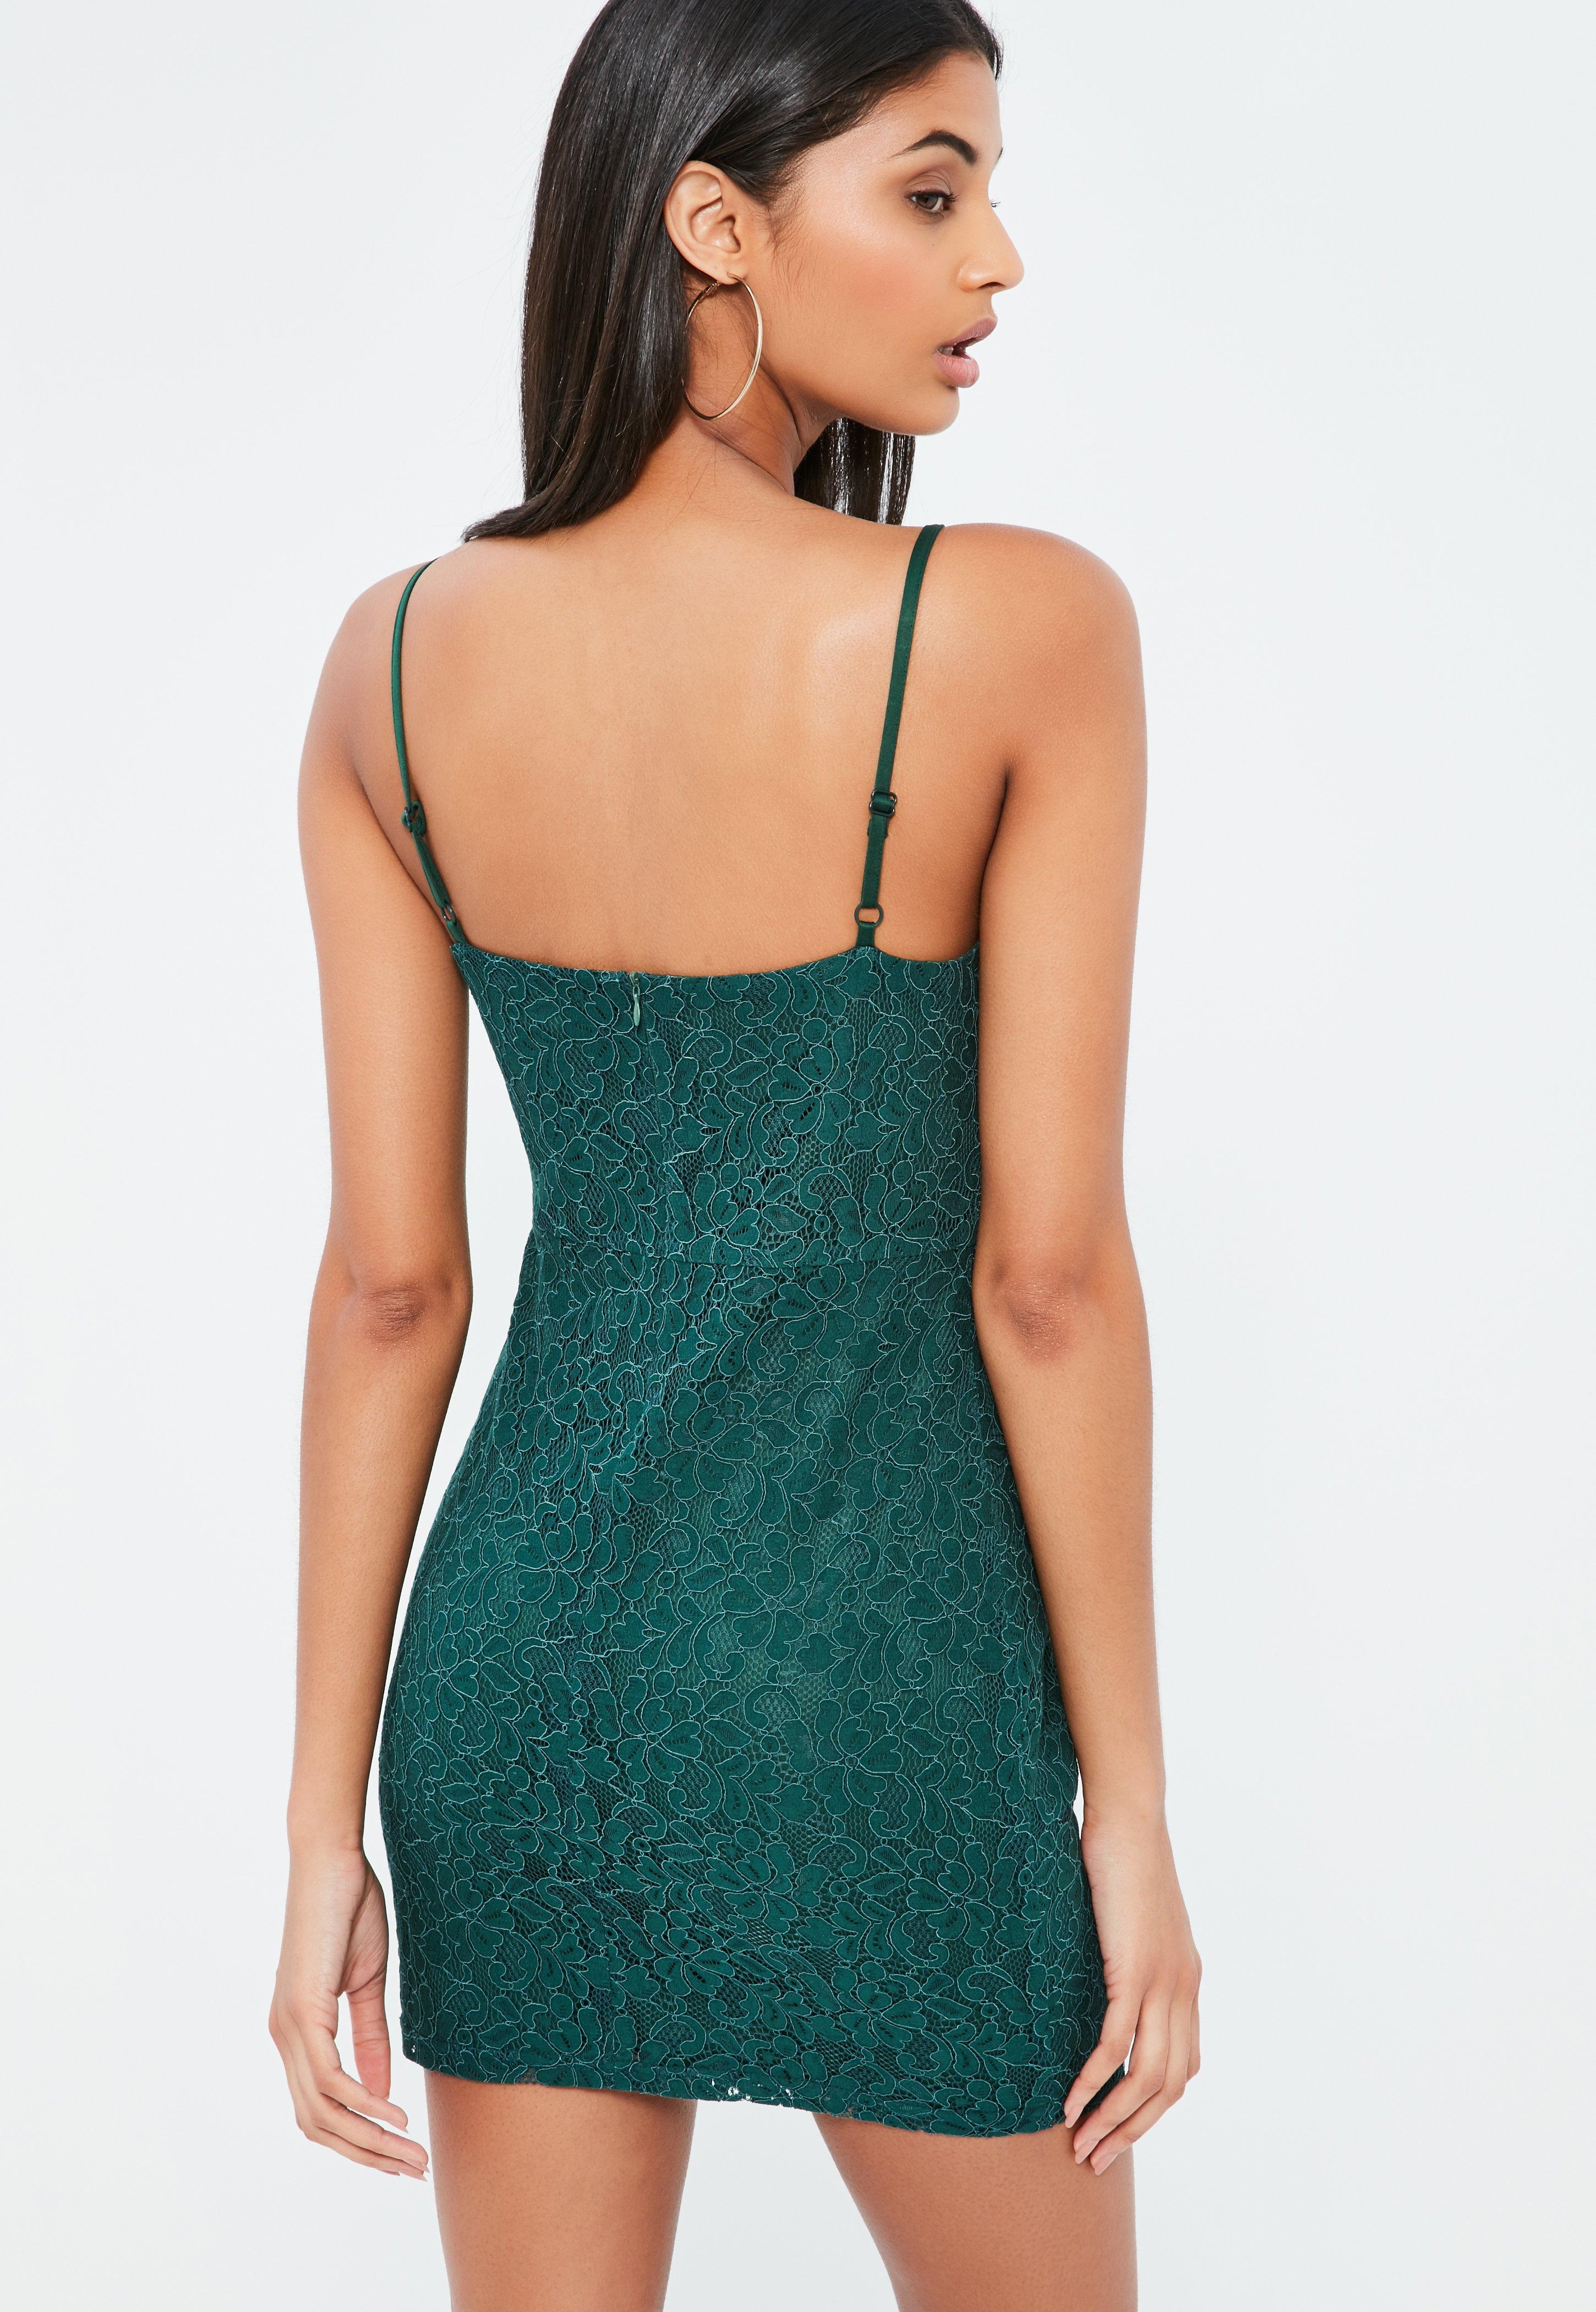 Green Lace Strappy Bodycon Dress